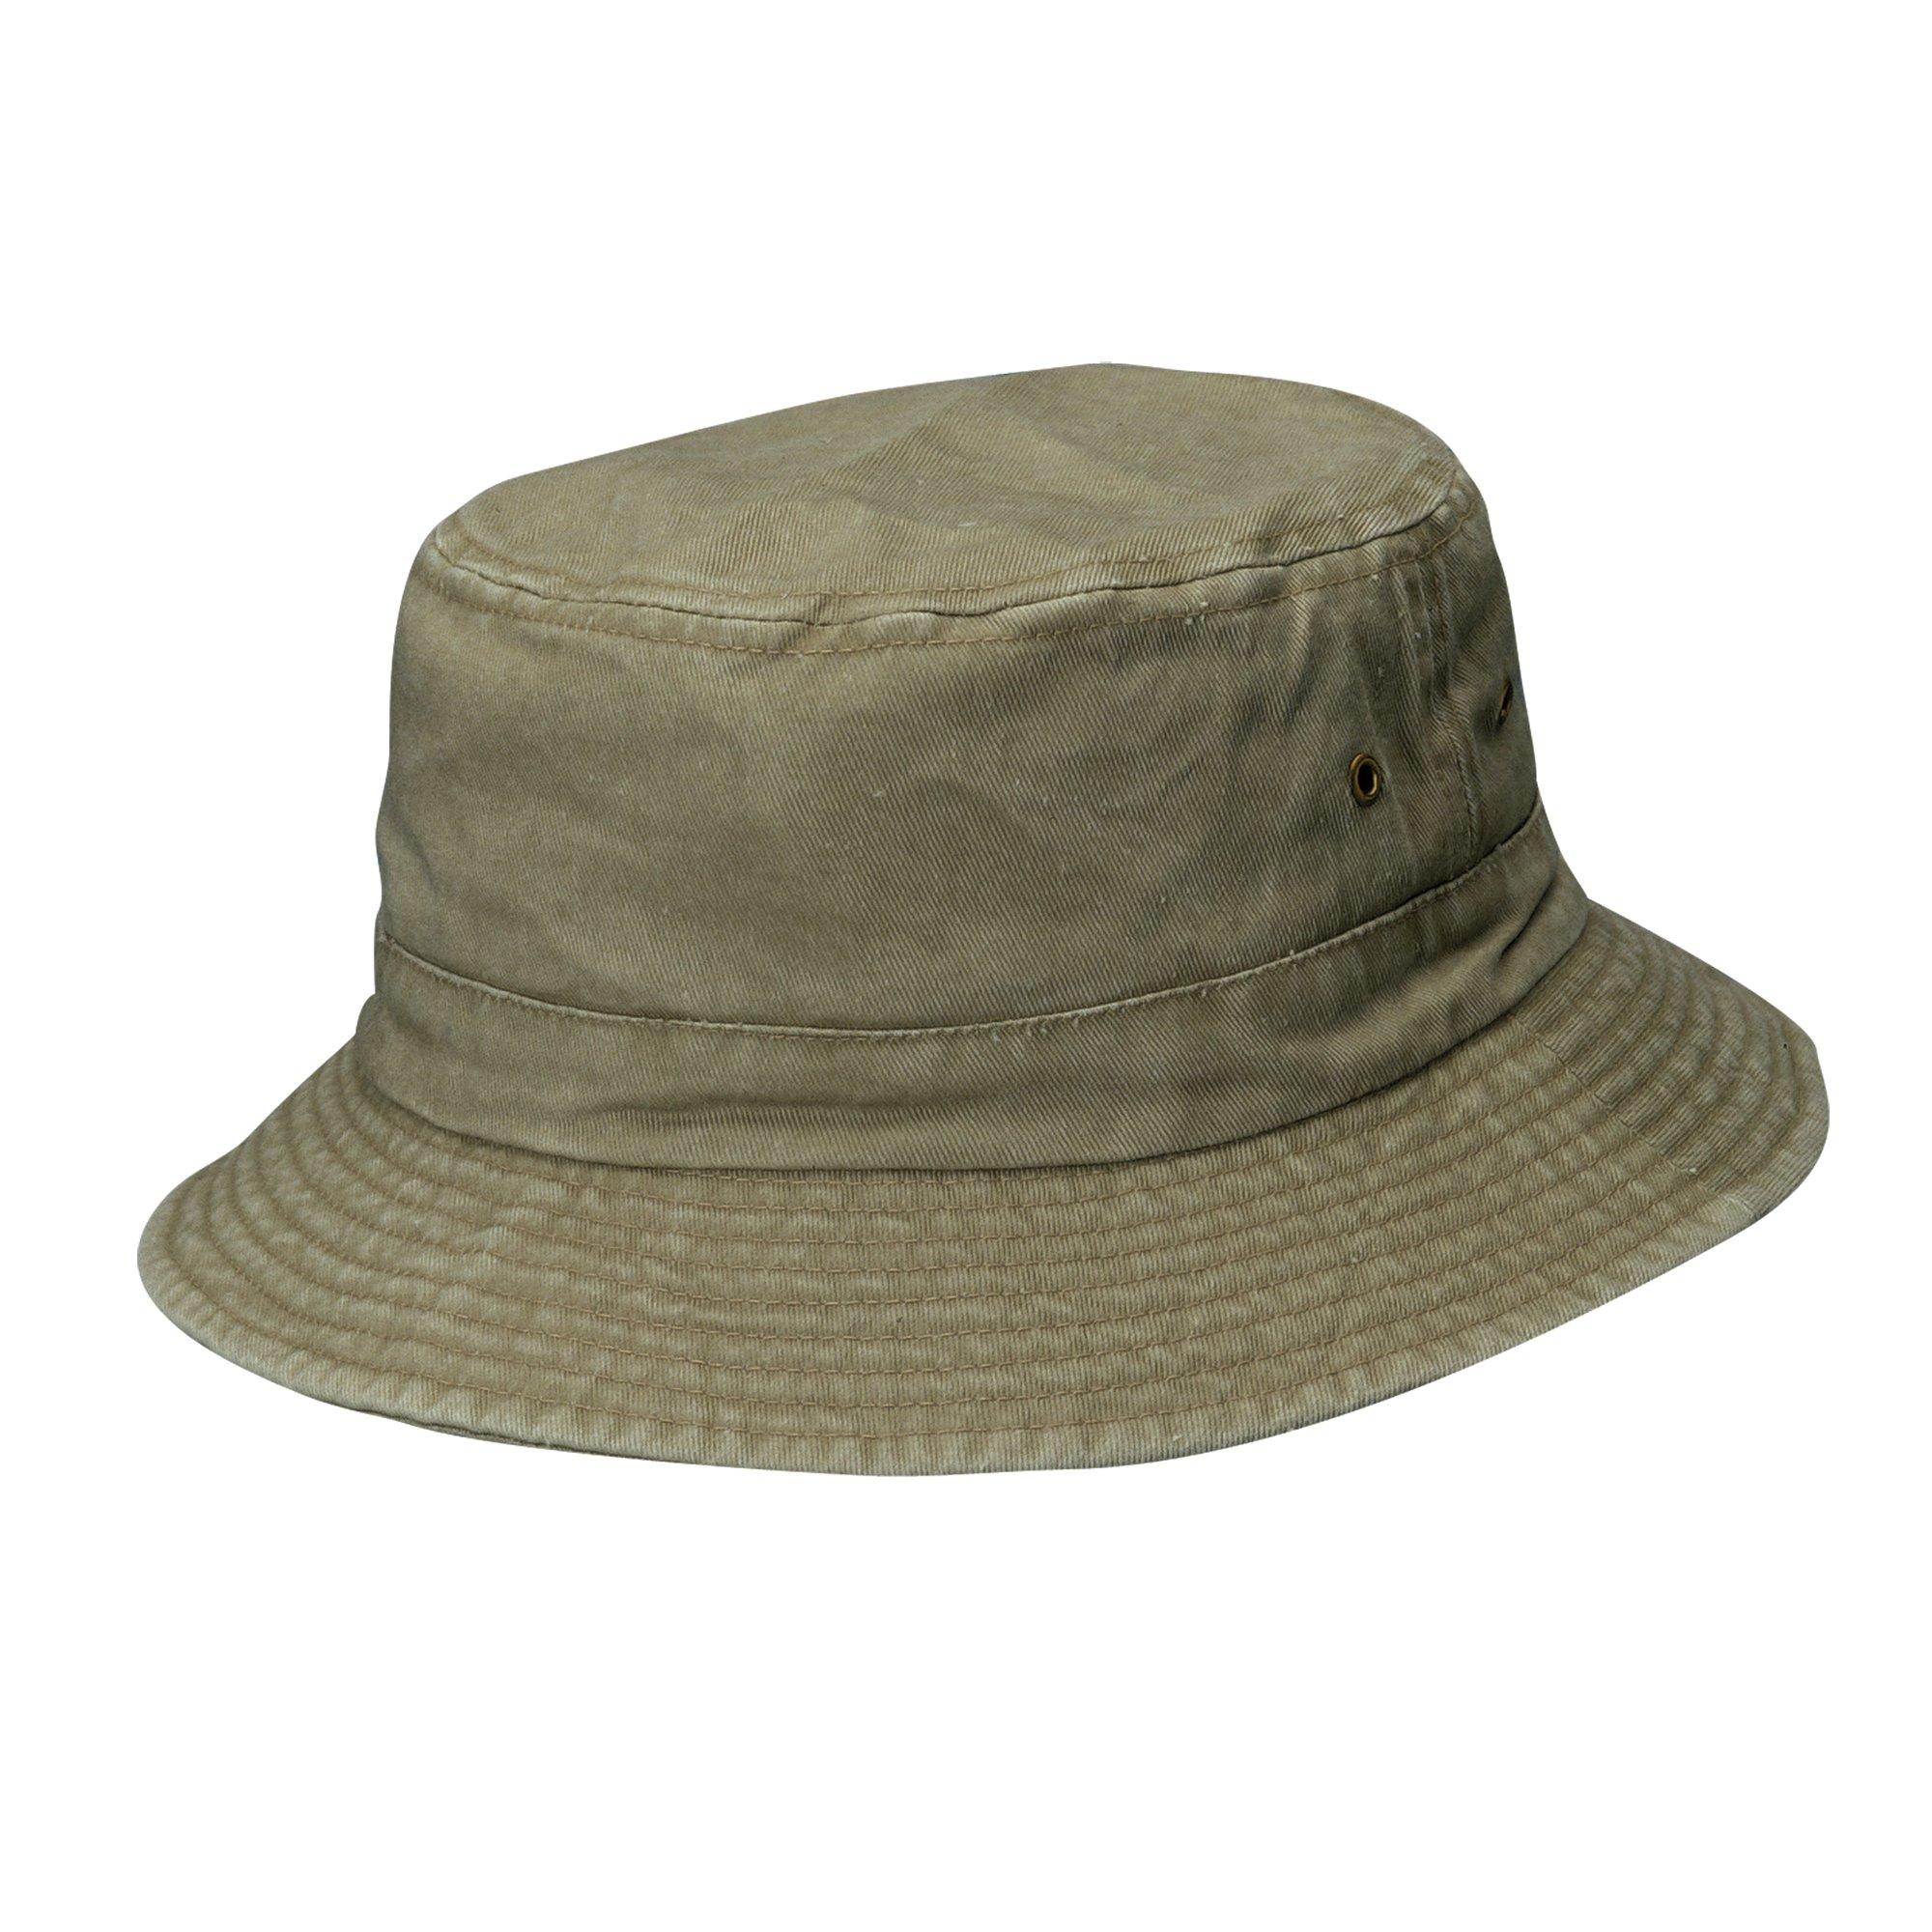 Dorfman Pacific Hats Cotton Bucket Hat Camouflage